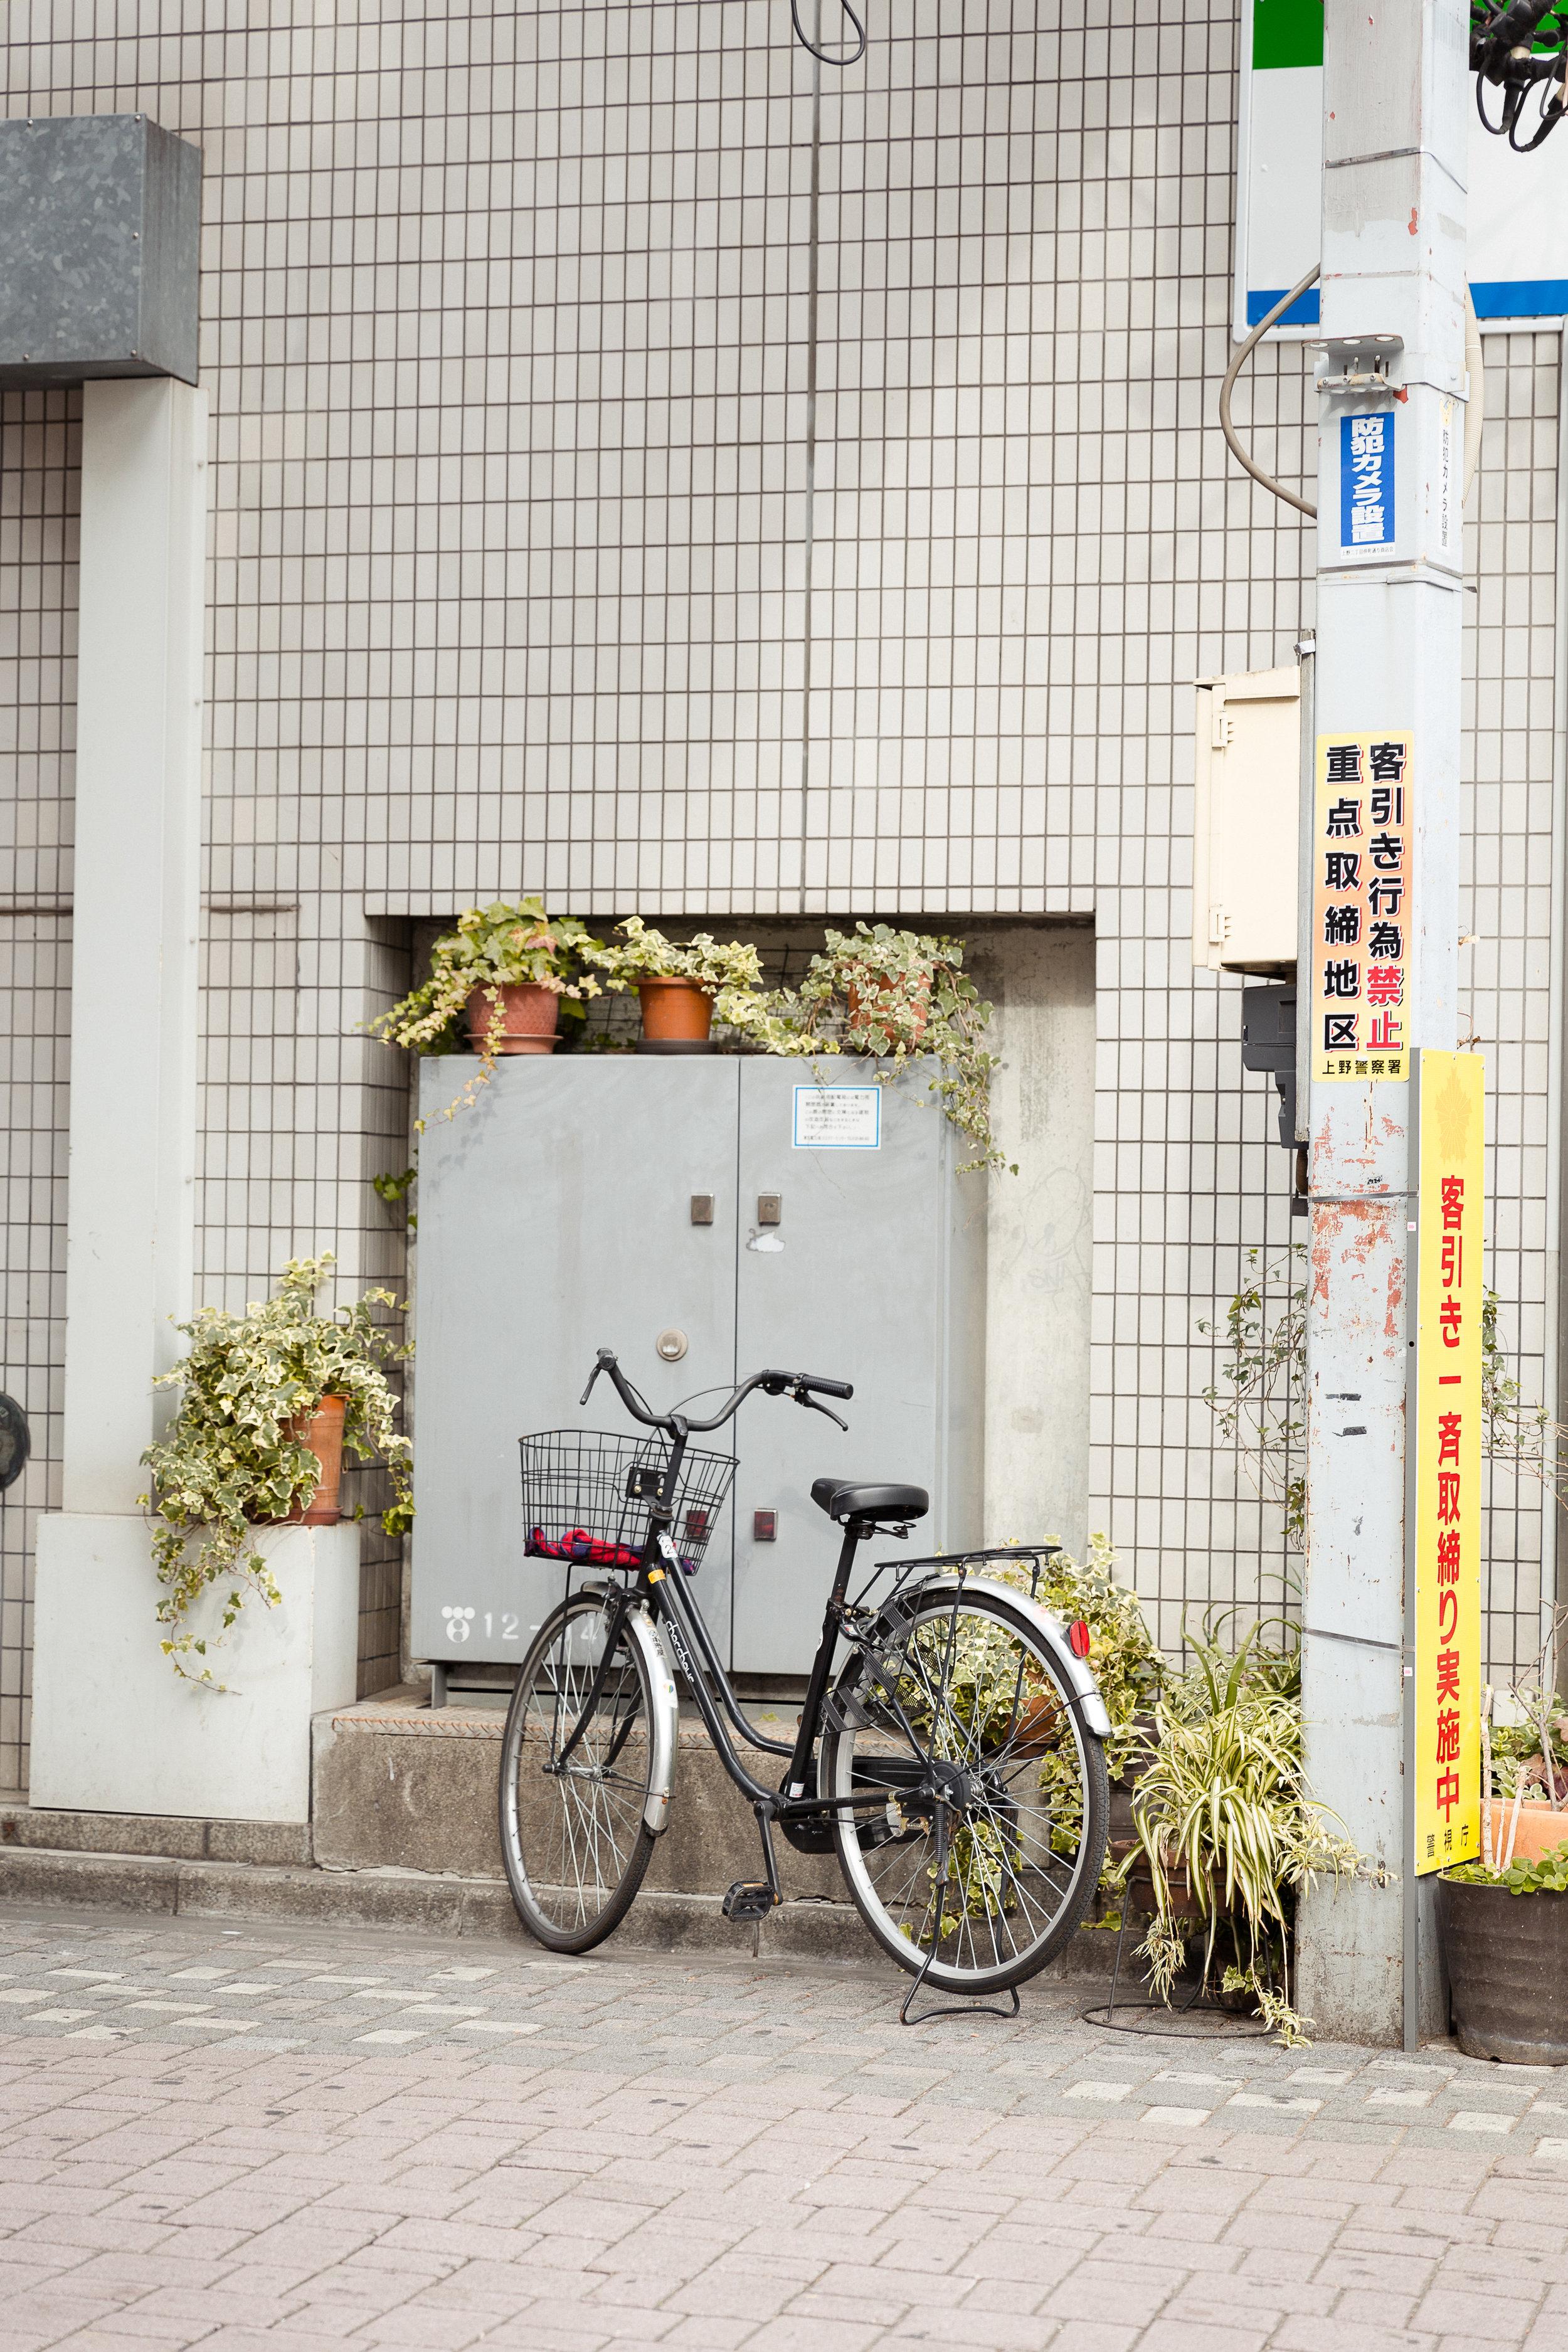 Bike in Tokyo Japan